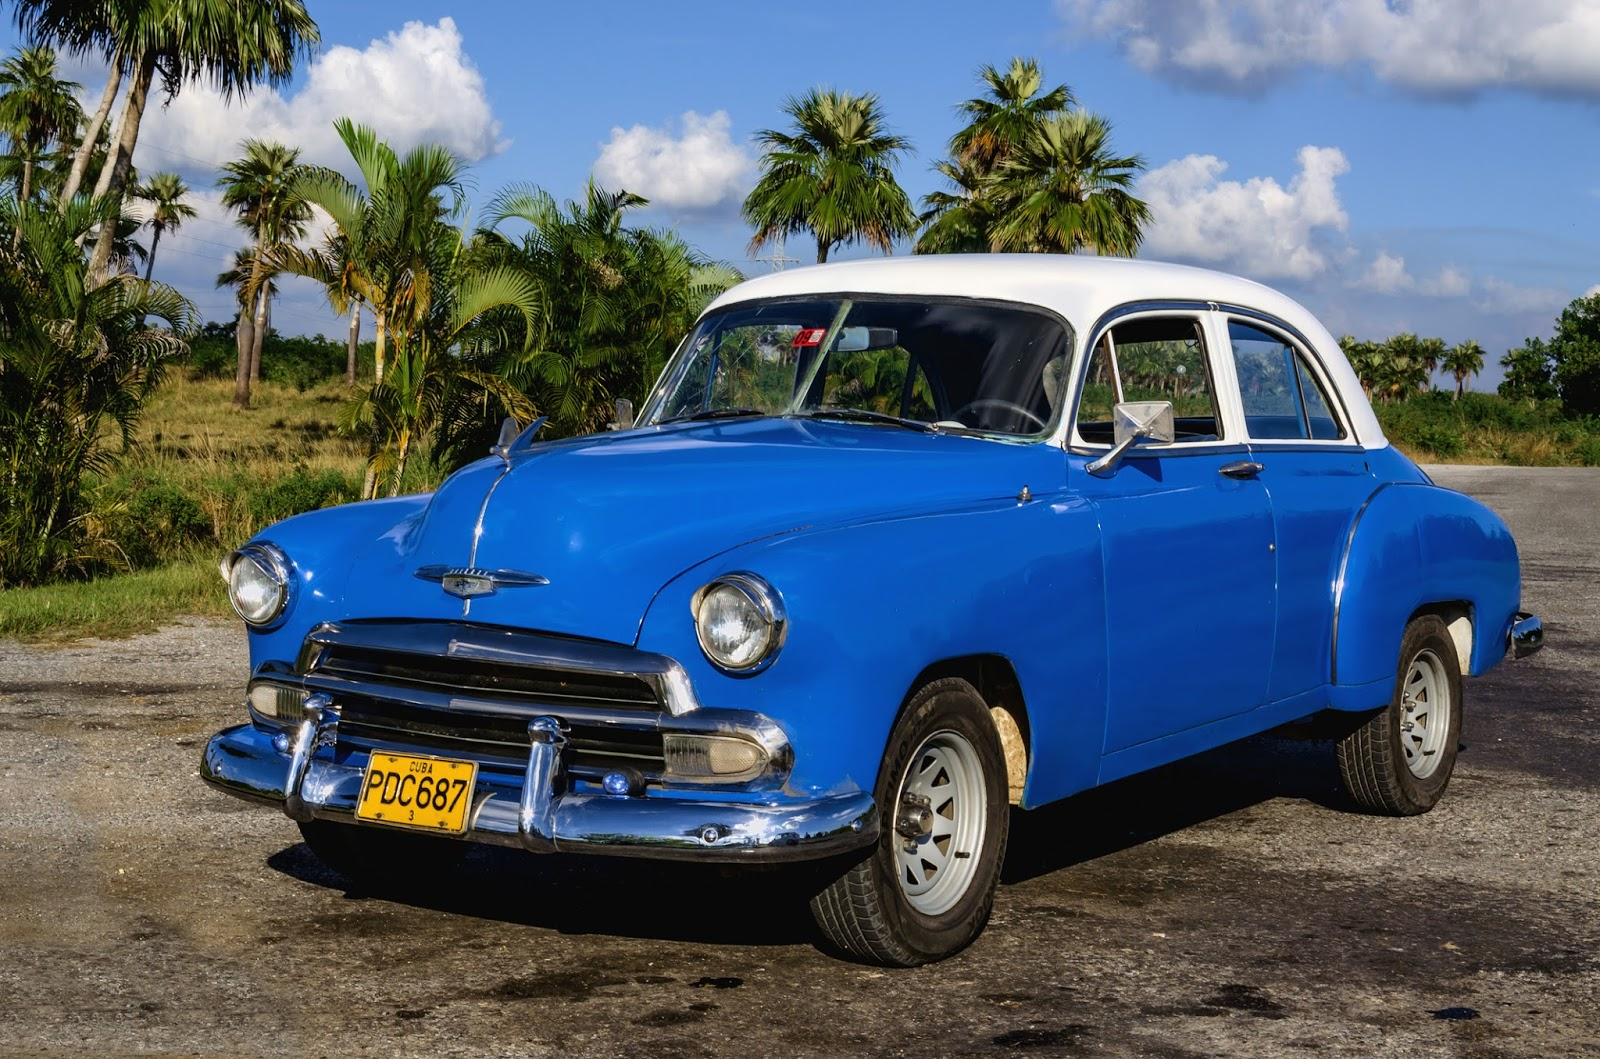 Vintage And Classic Car Blog November - Classic car studio tv show